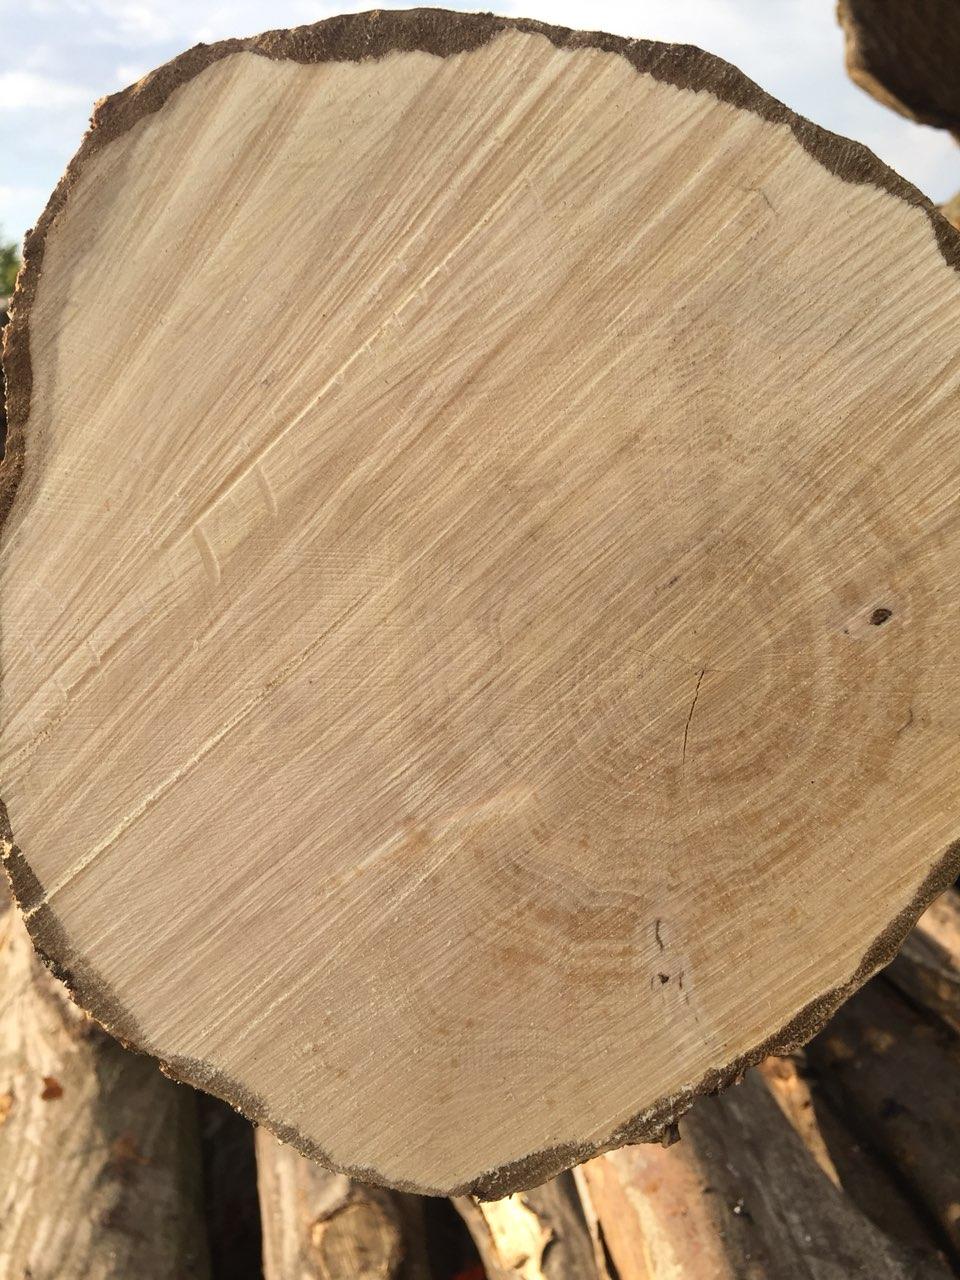 Habr dřevo